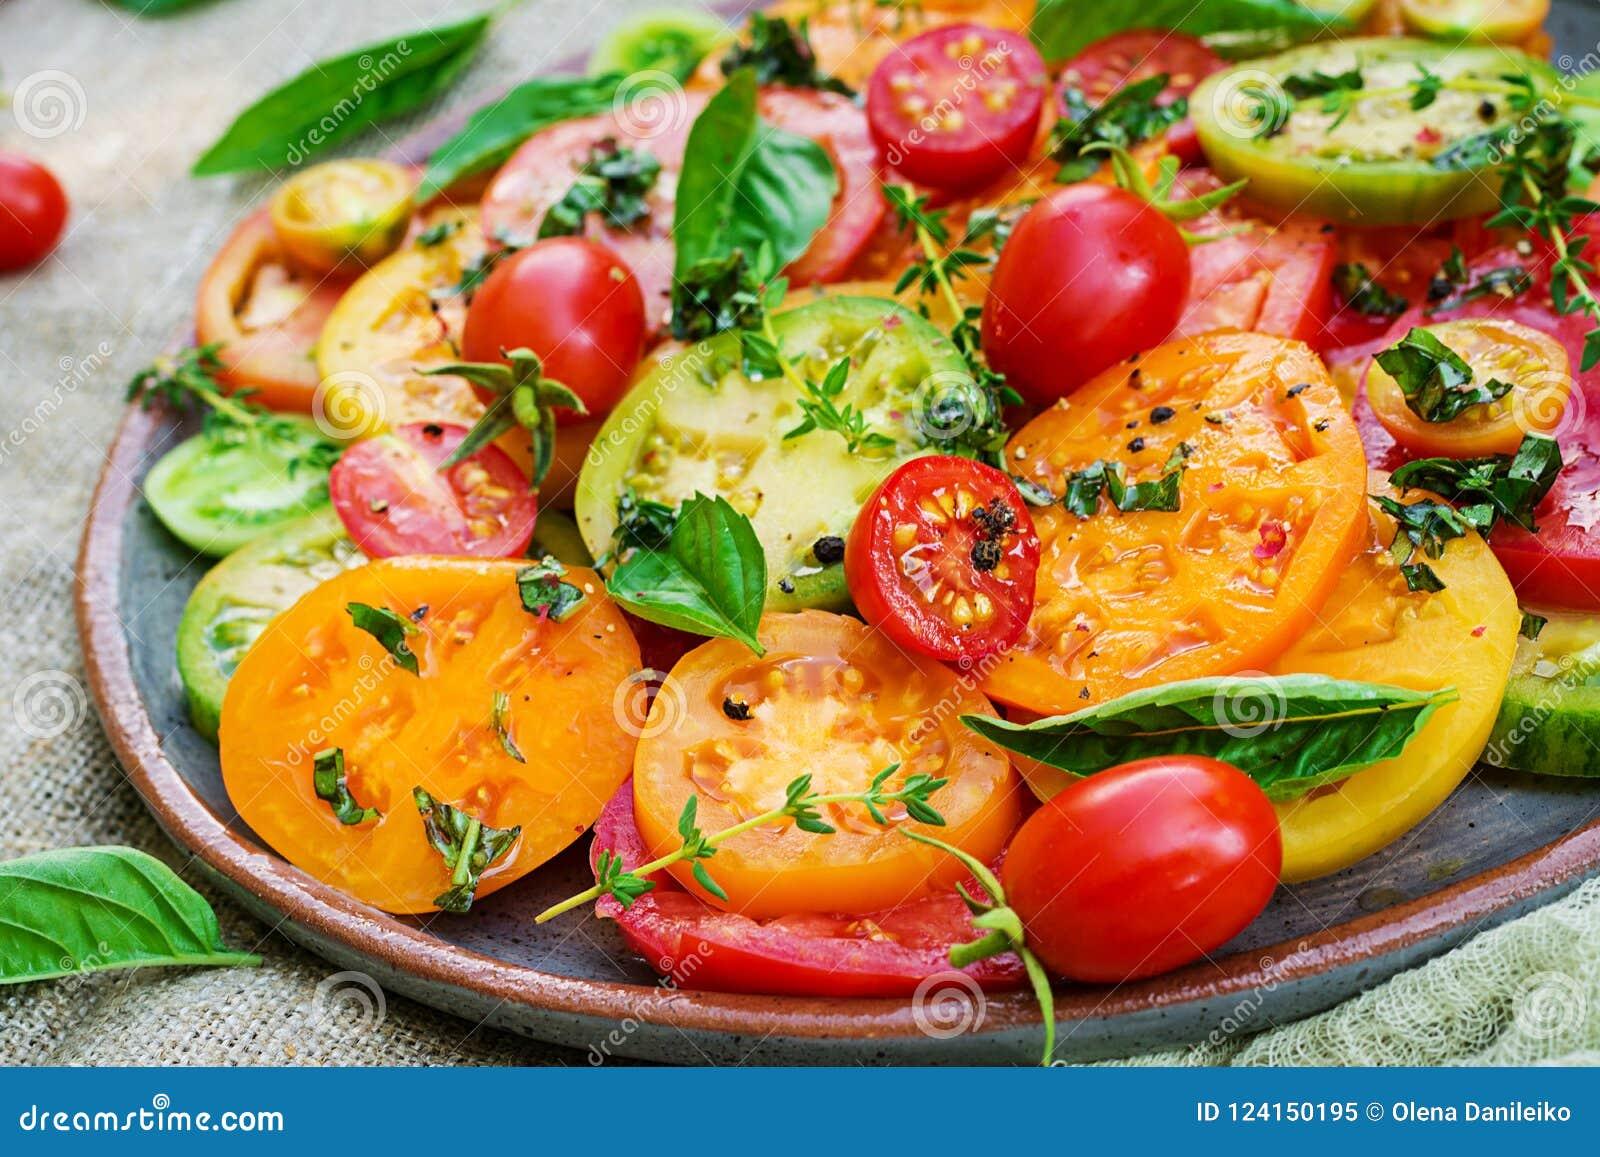 Colored tomato salad with onion and basil. Vegan food.